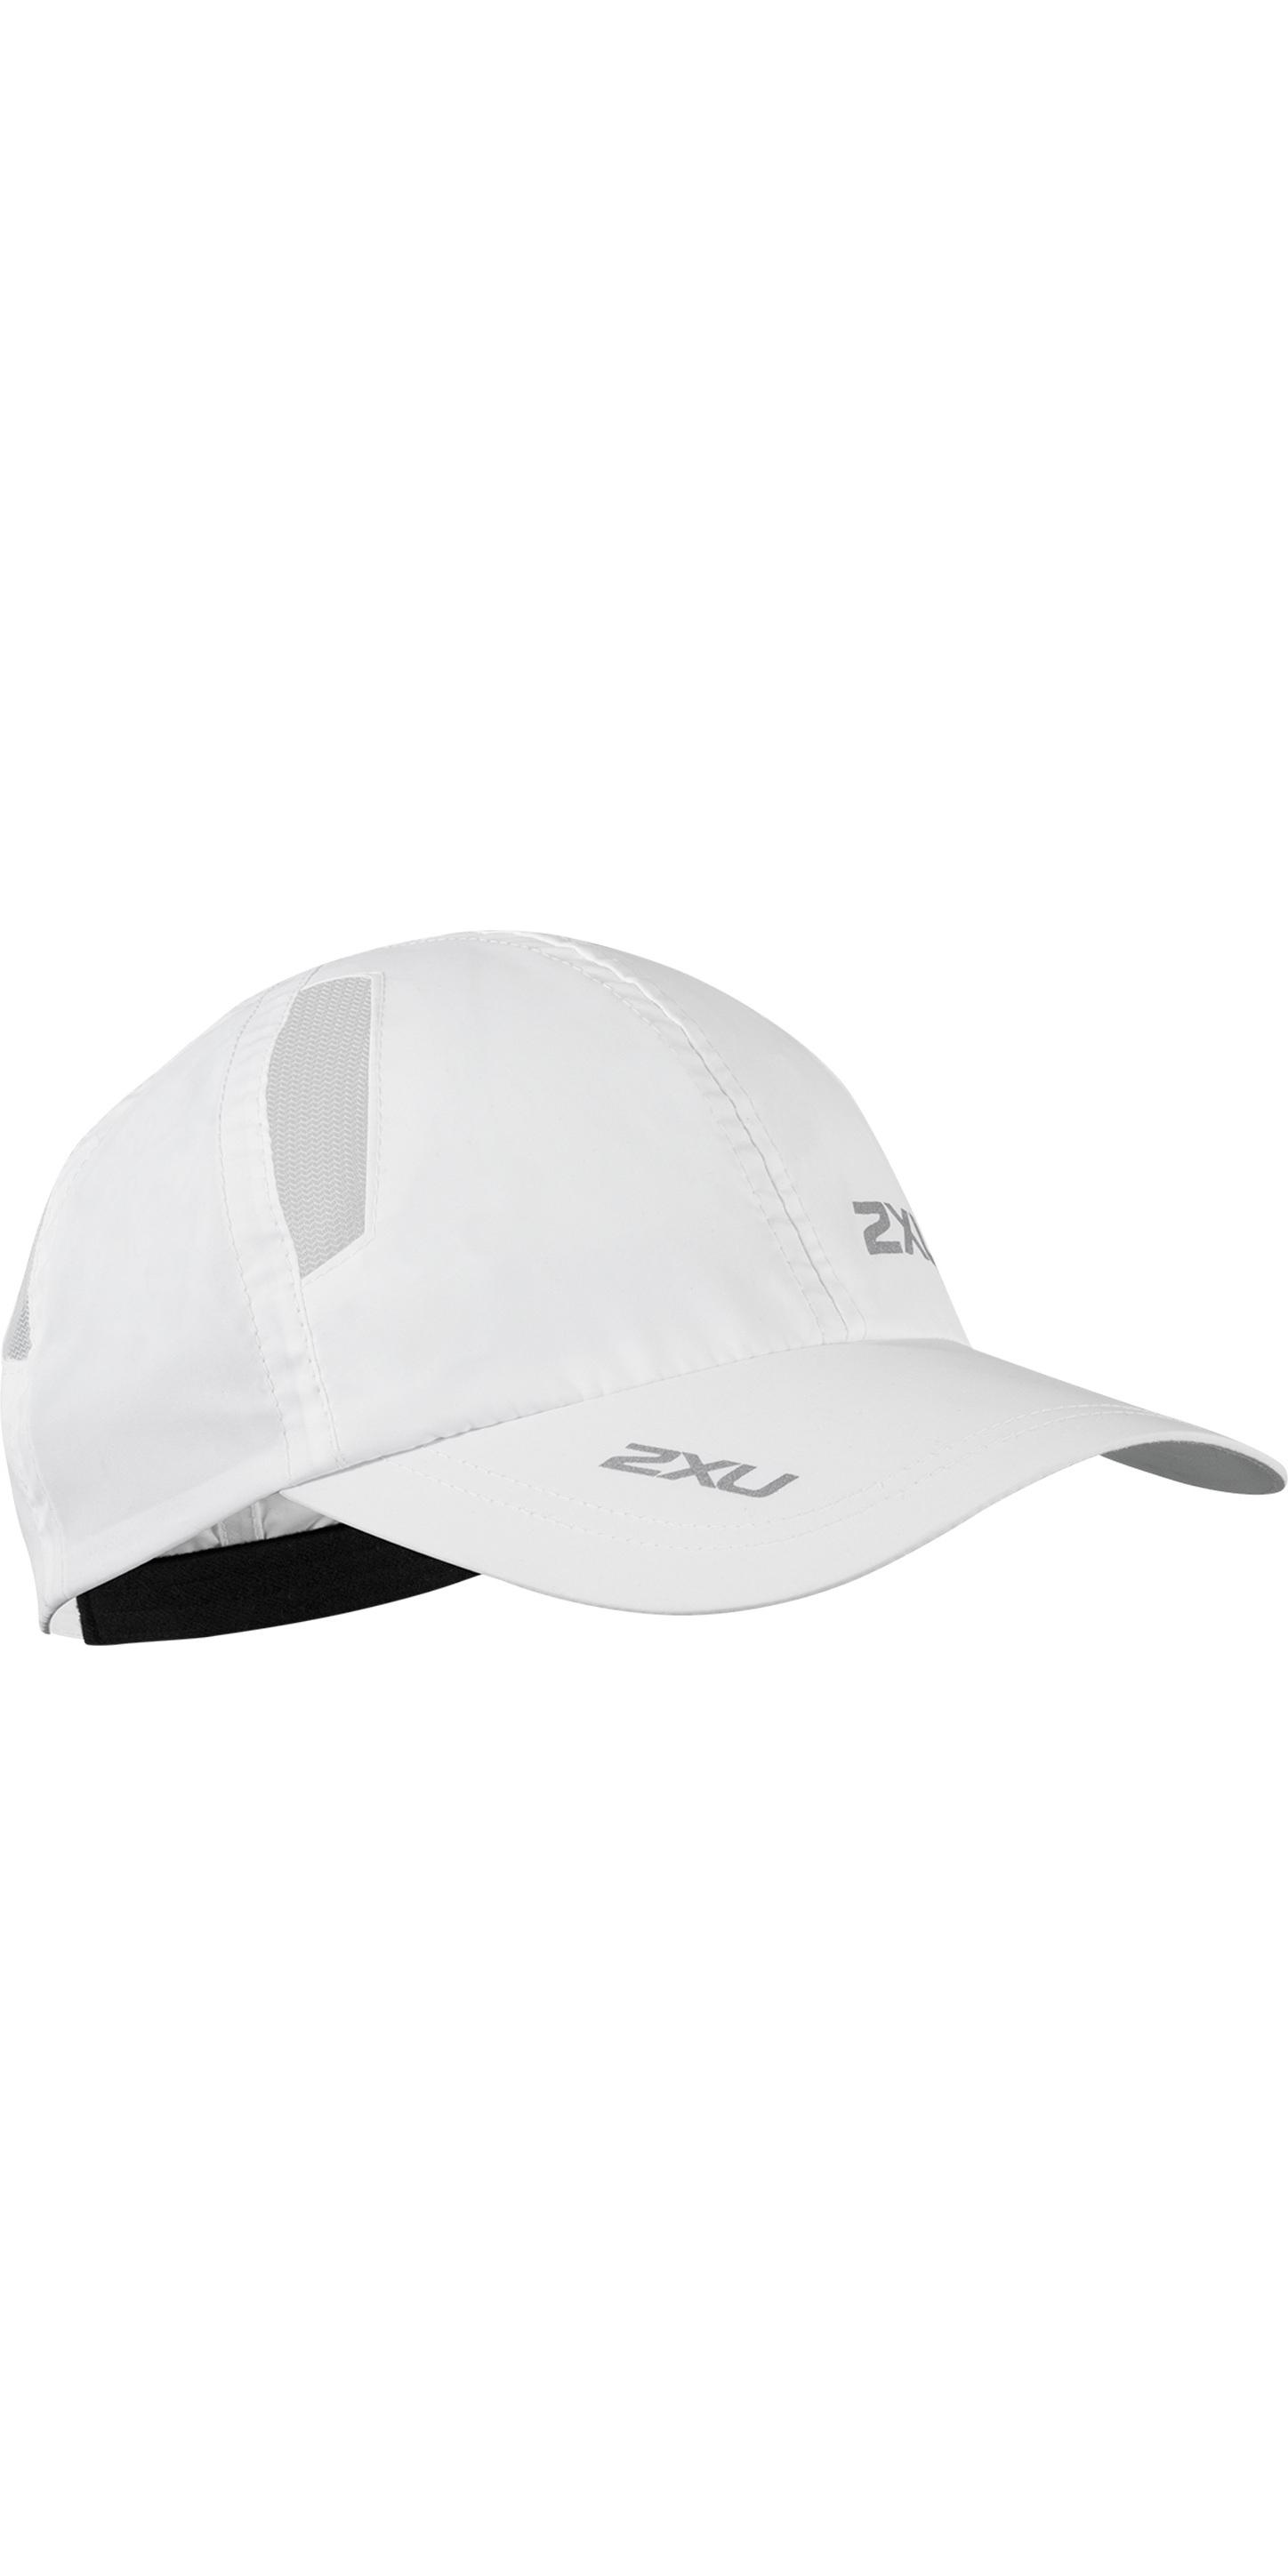 1eec8e8ad7c60 2019 2XU Run Cap White Uq5685f - Technical Hats Caps   Visors - Gloves  Hoods   Hats